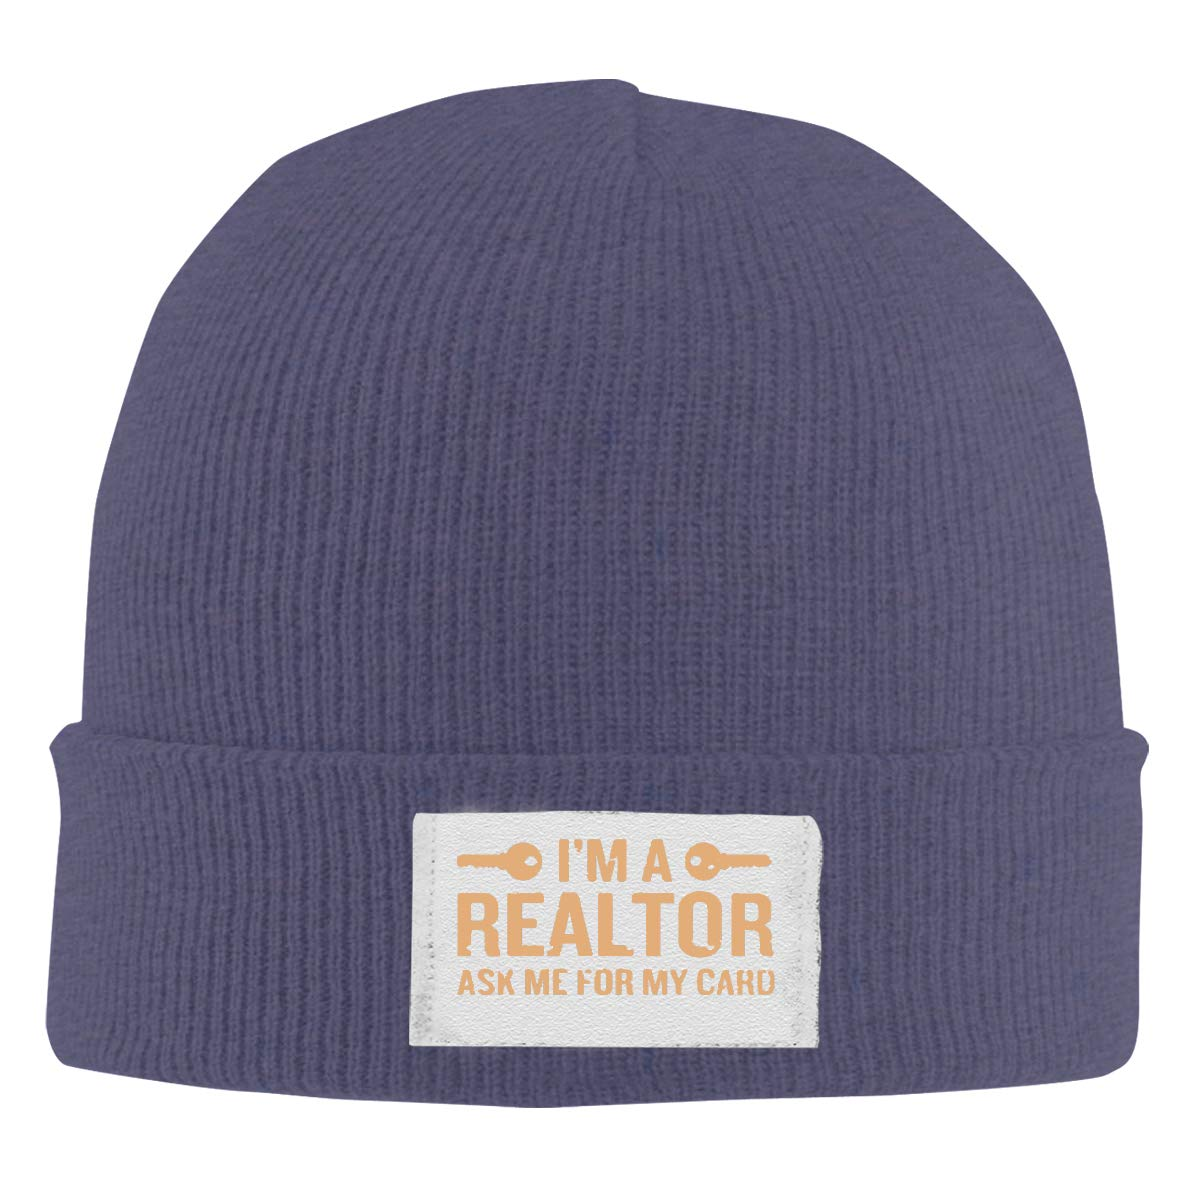 Im A Realtor Dyed Washed Top Level Beanie Men Women Unisex Stylish Slouch Beanie Hats Black